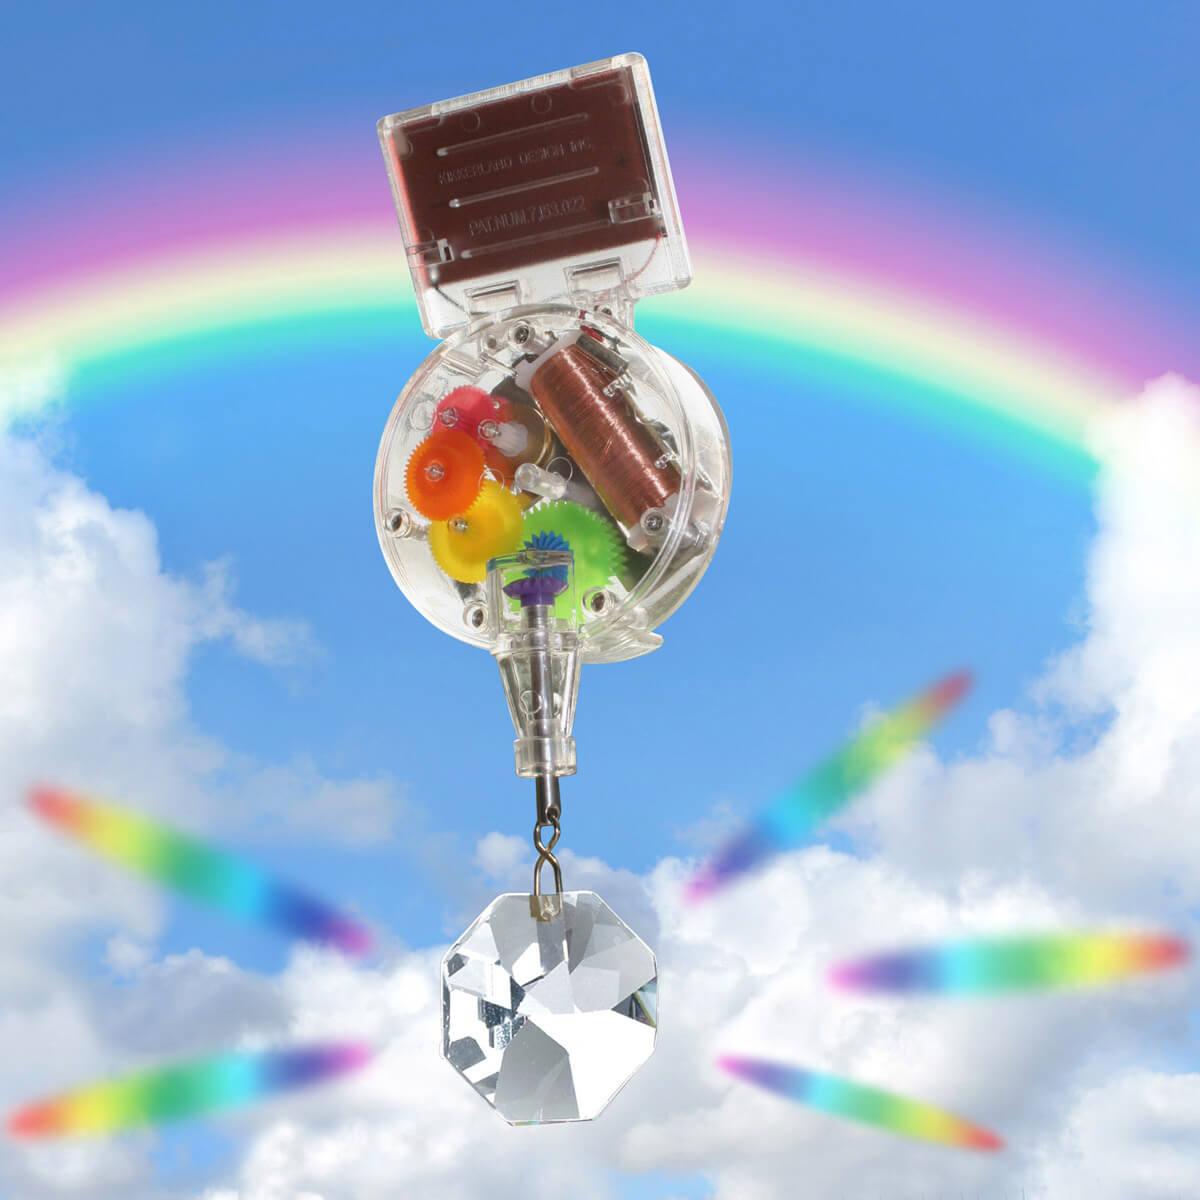 Solar Powered RainbowMaker